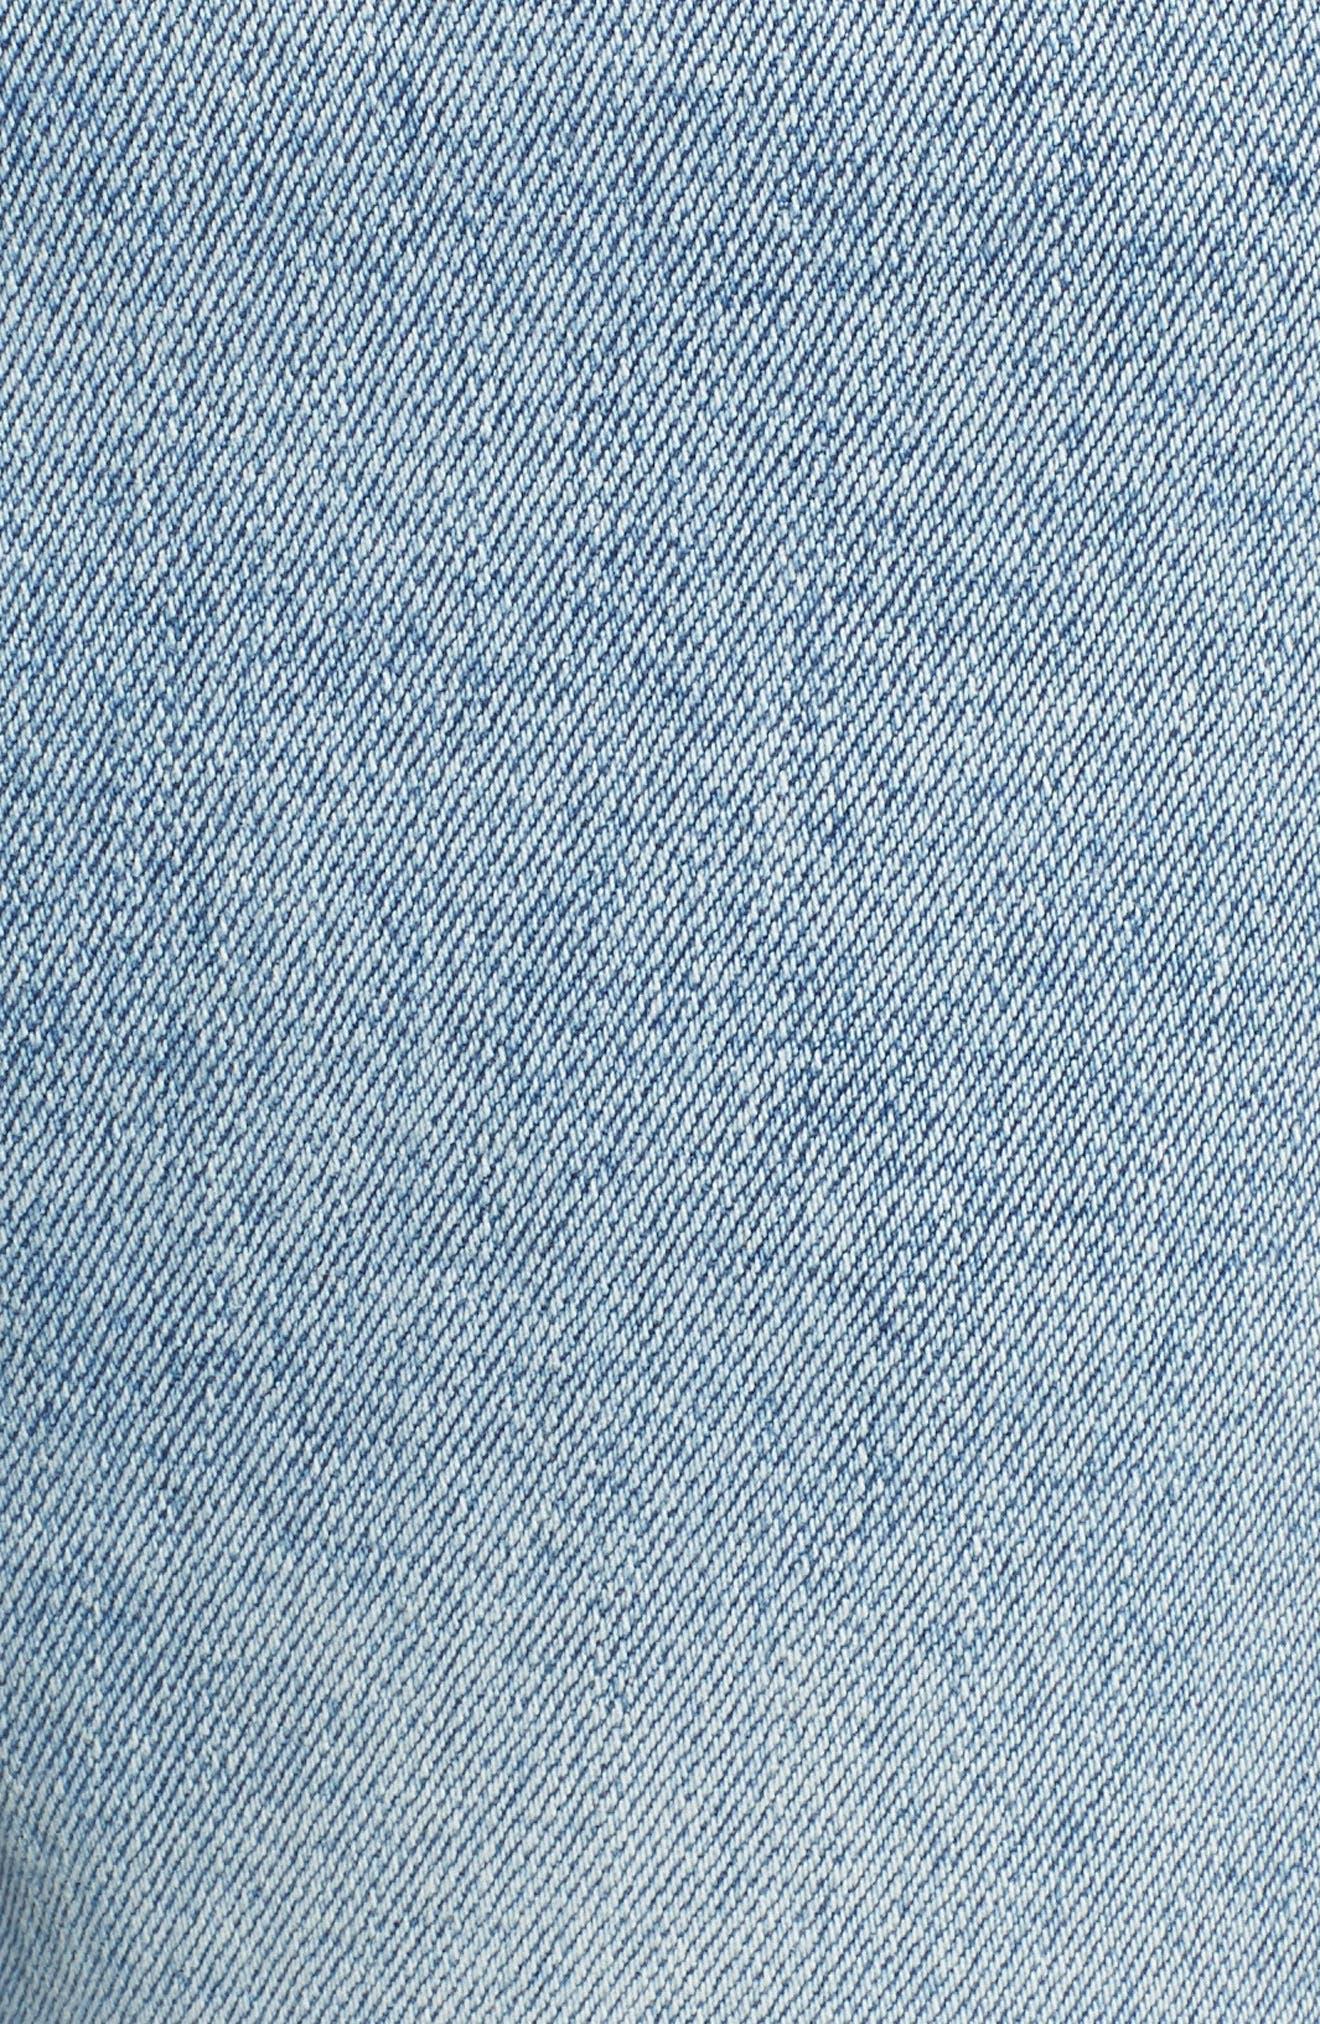 Bella Vintage Crop Slim Jeans,                             Alternate thumbnail 6, color,                             430